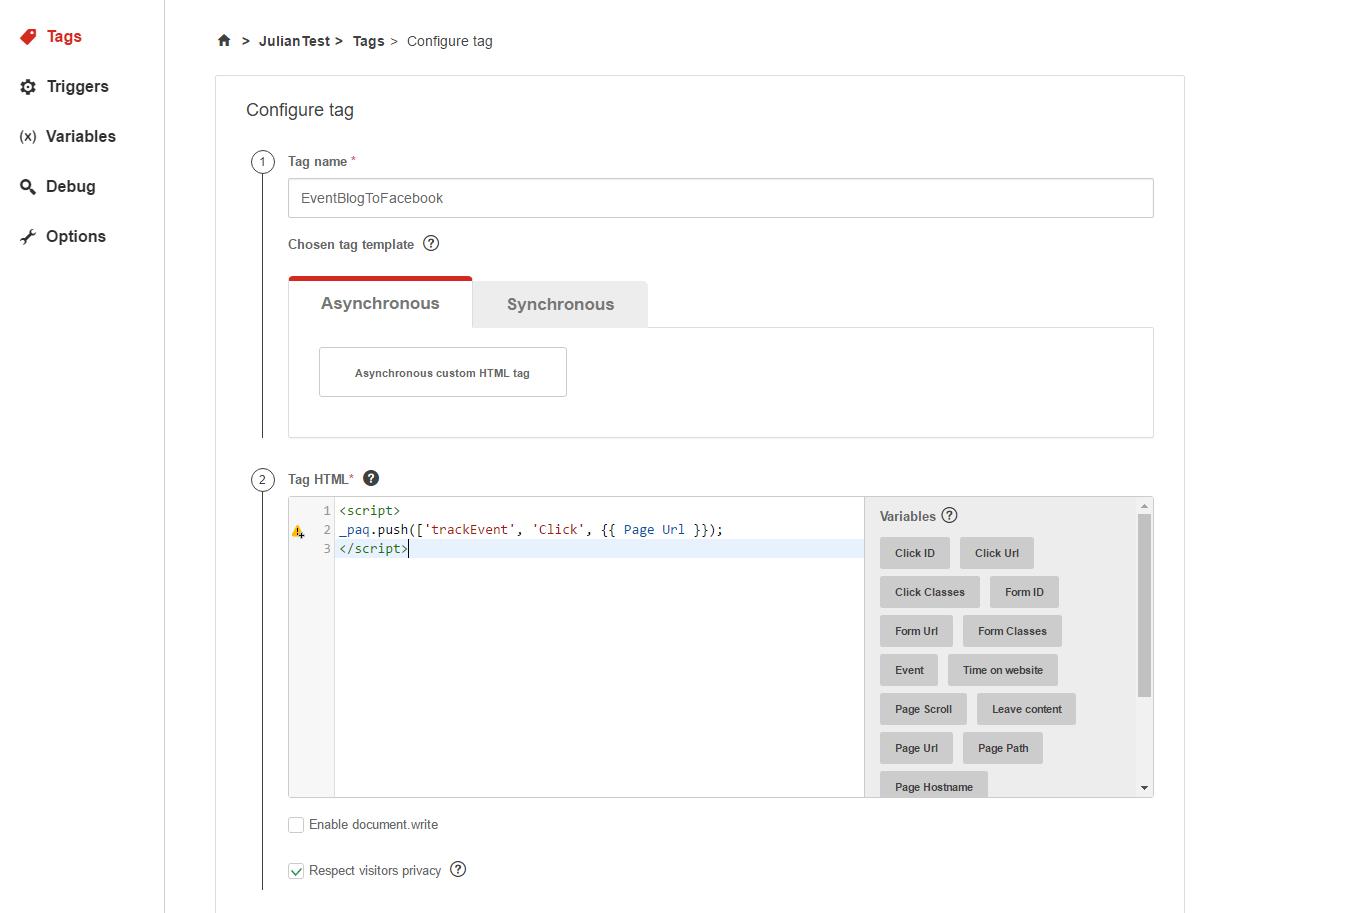 Create and Configure tag